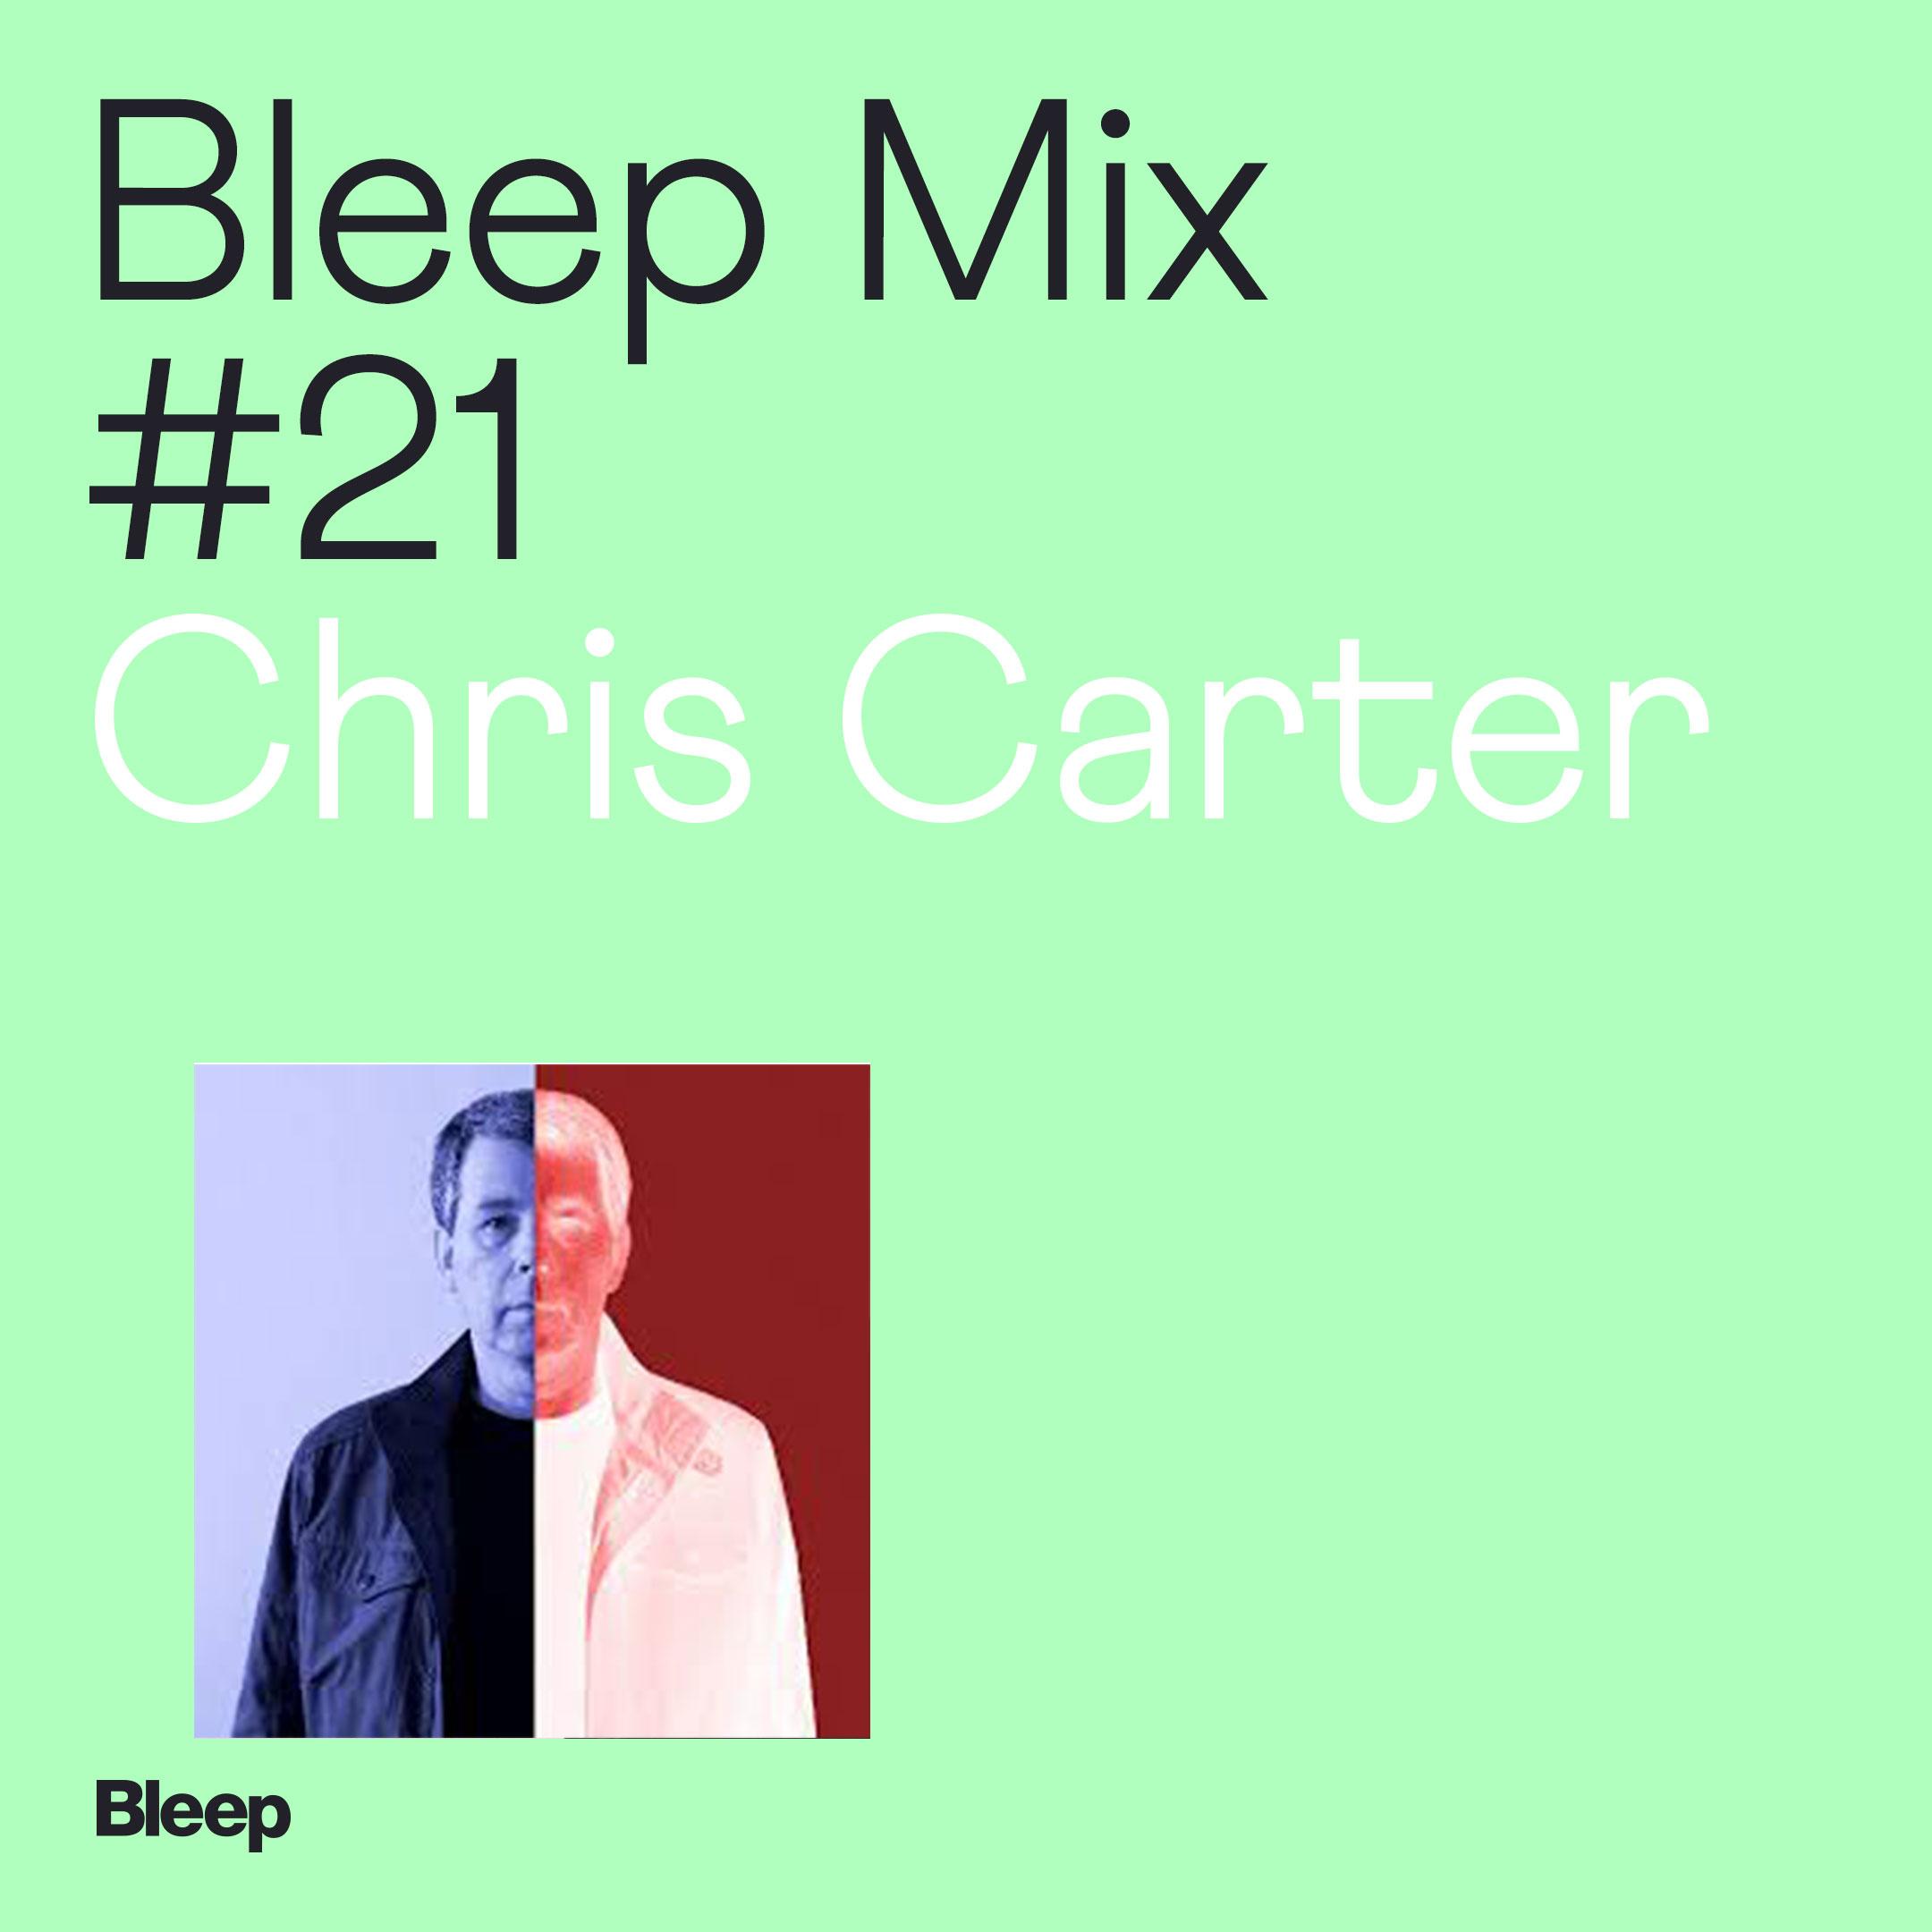 Bleep Mix #21 - Chris Carter